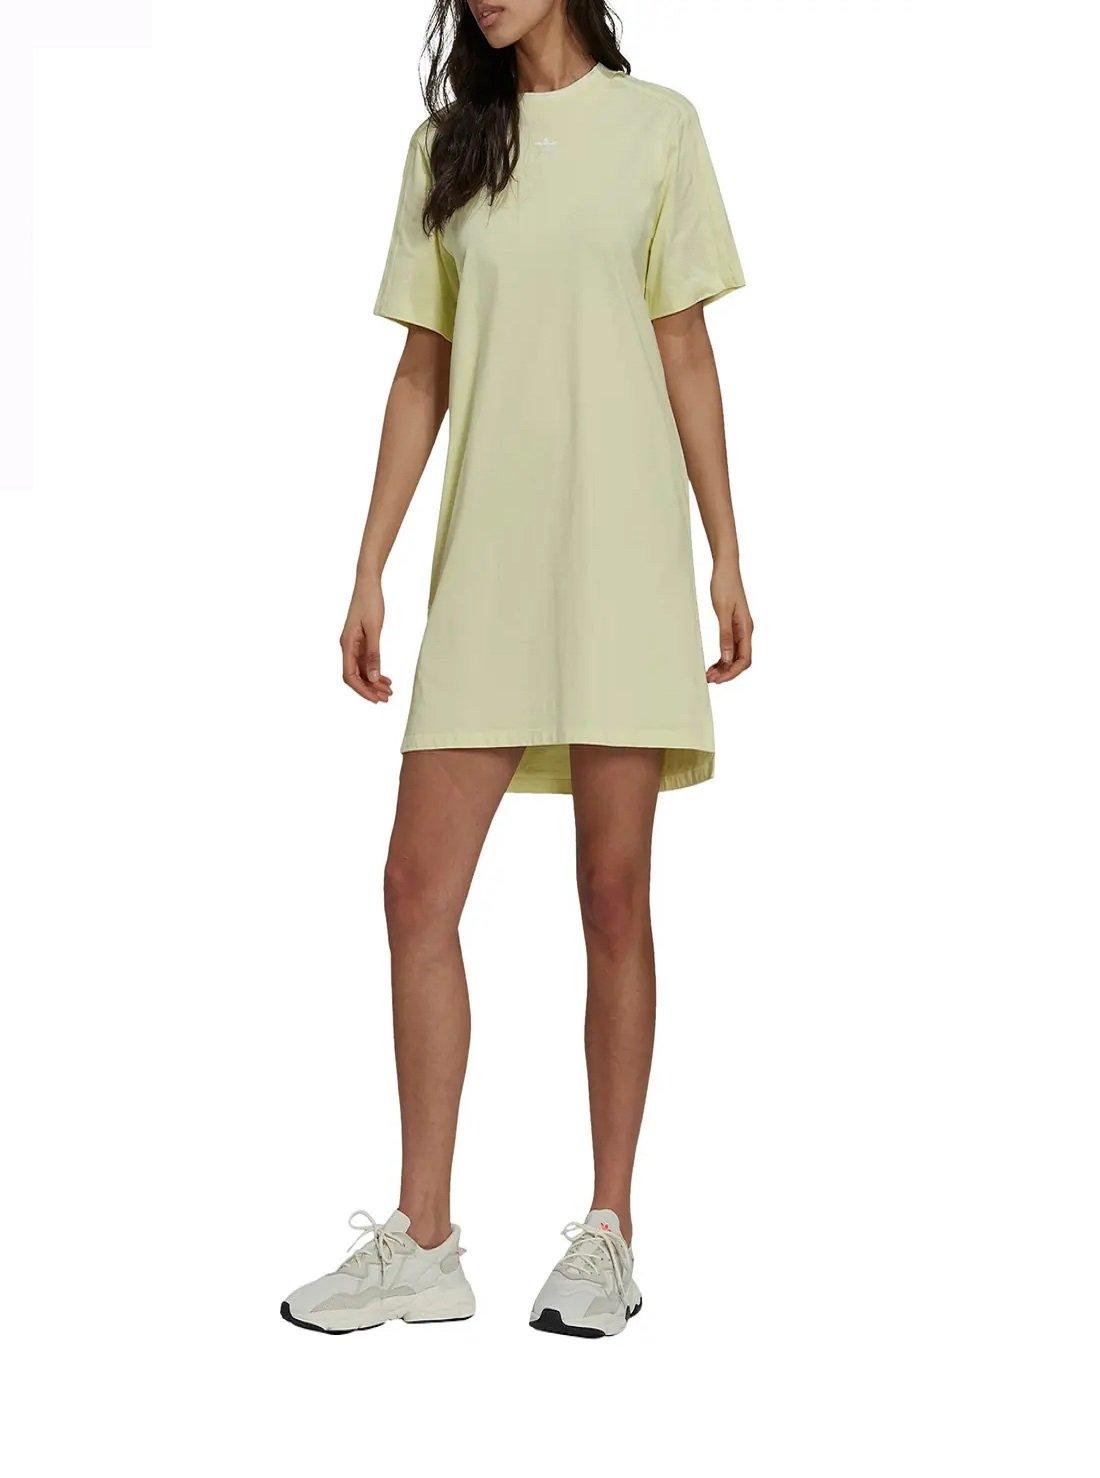 3-Stripes T-Shirt Dress